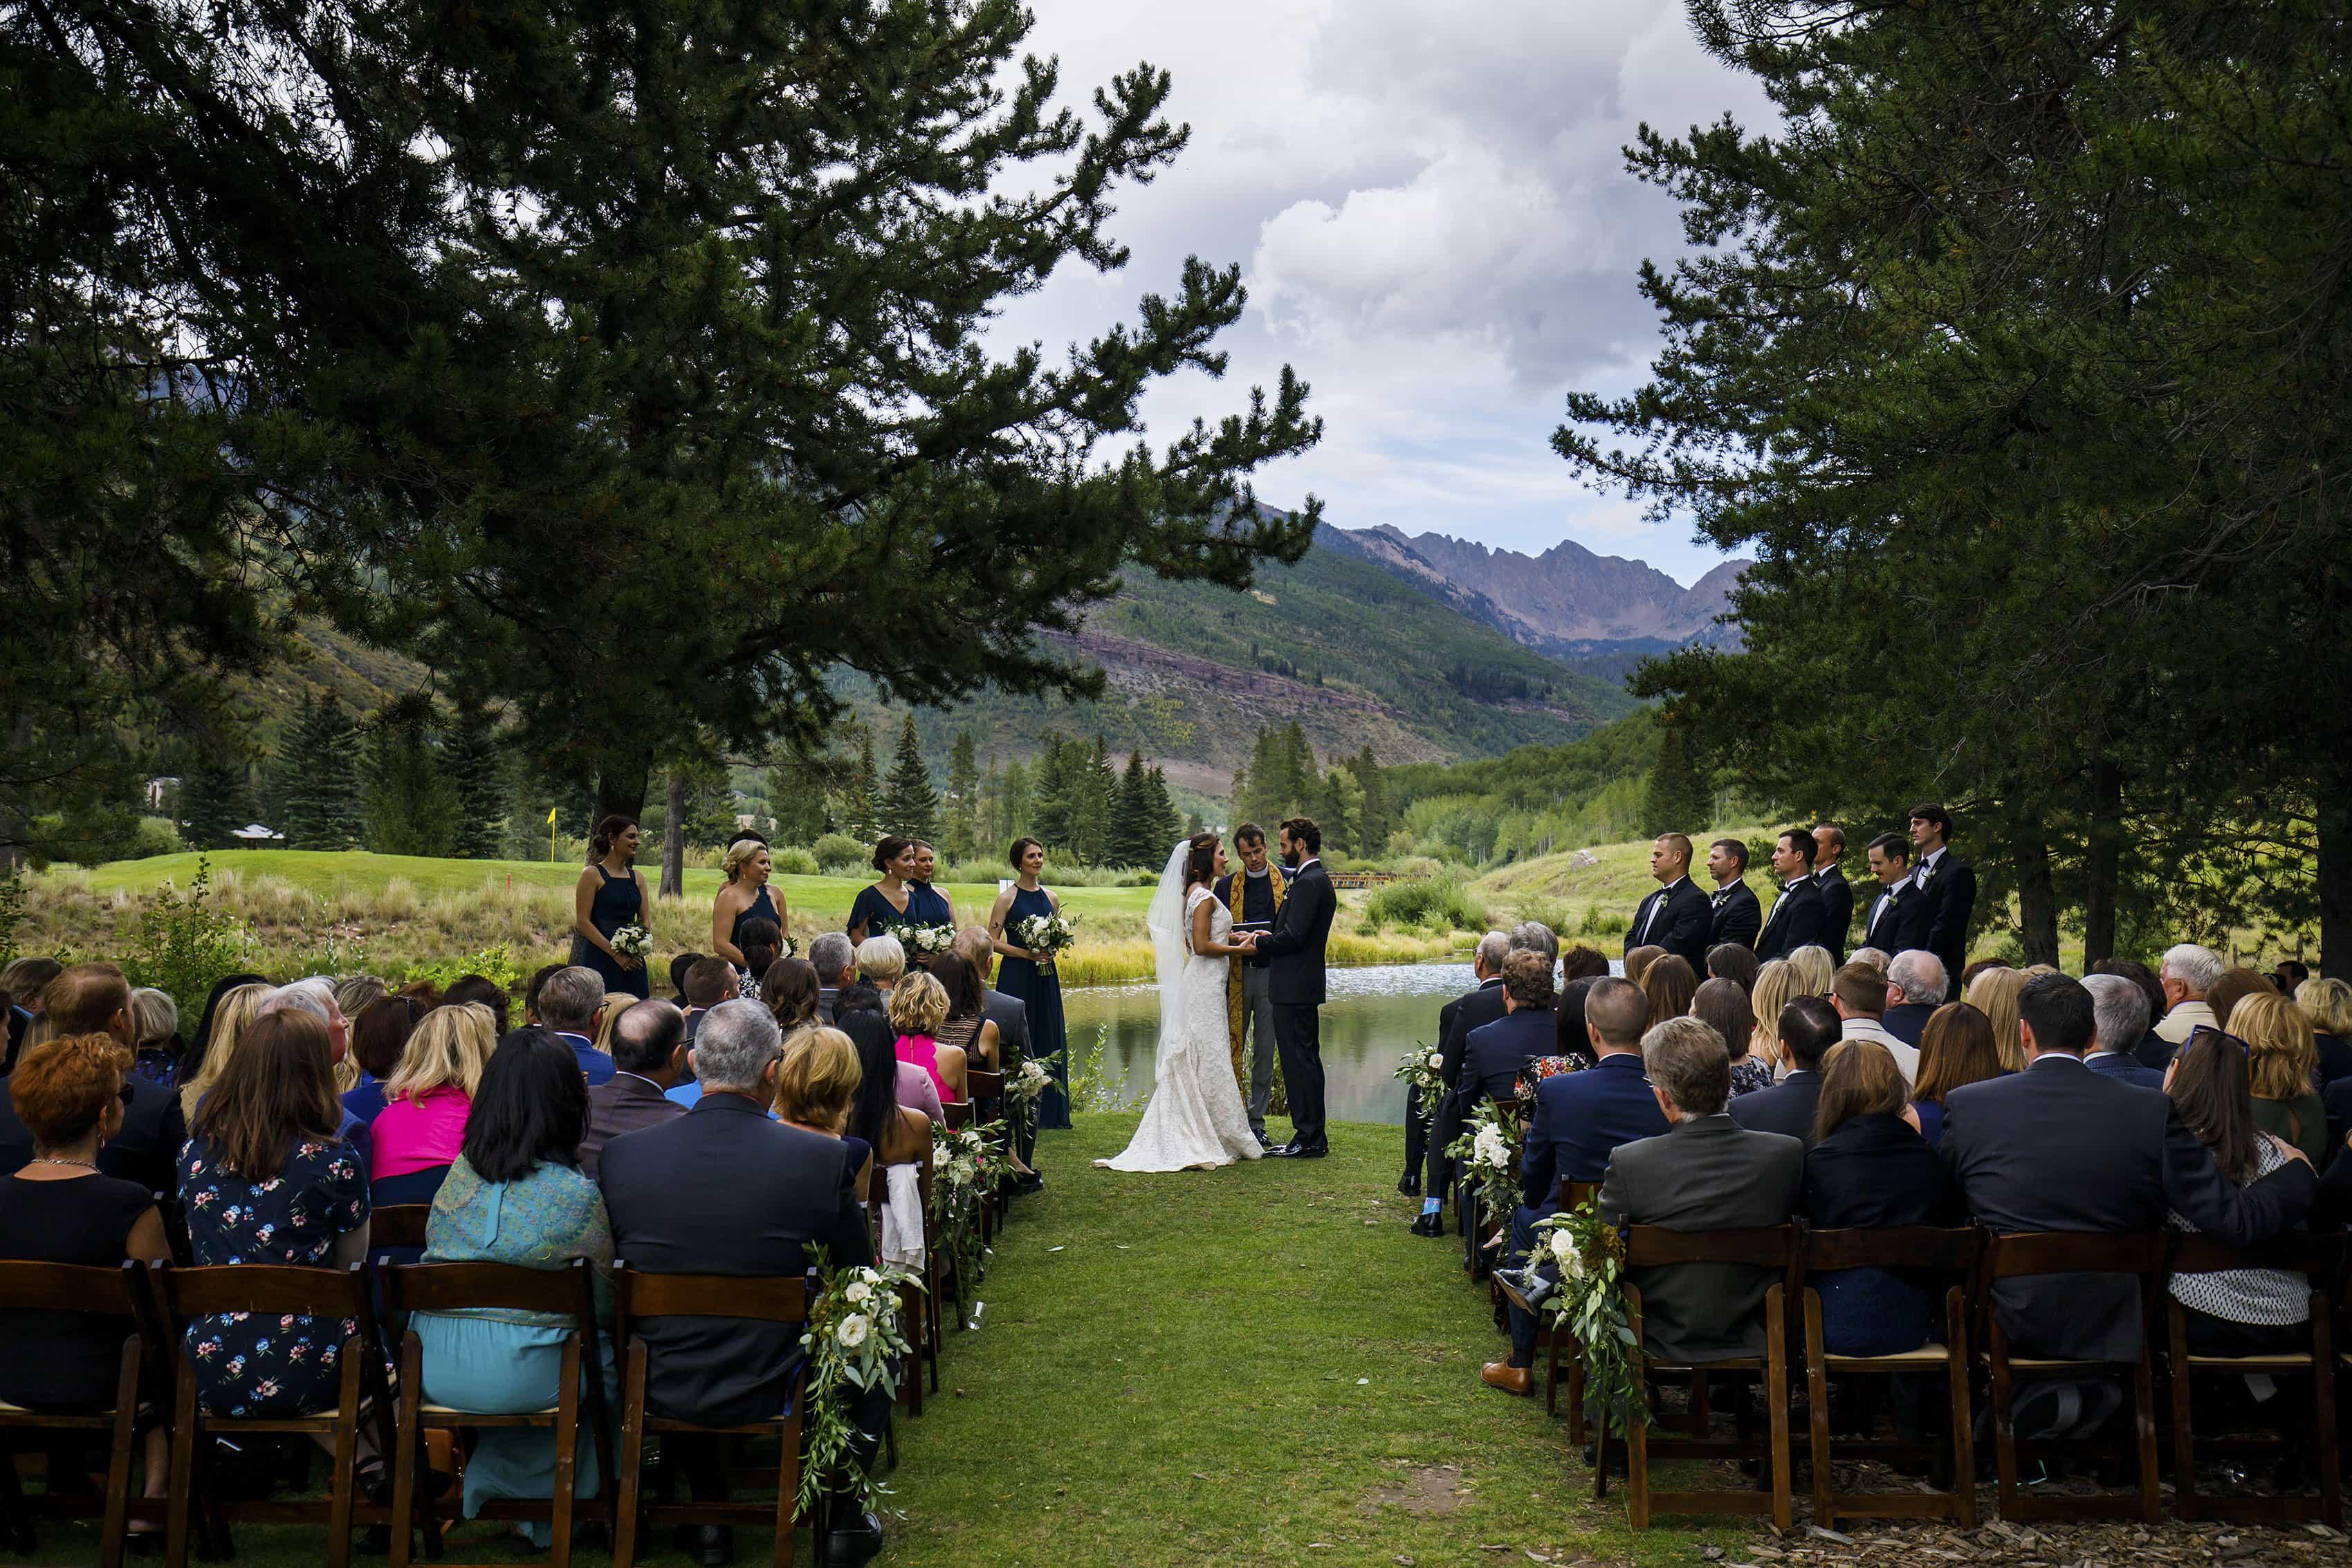 Vail Wedding Island ceremony